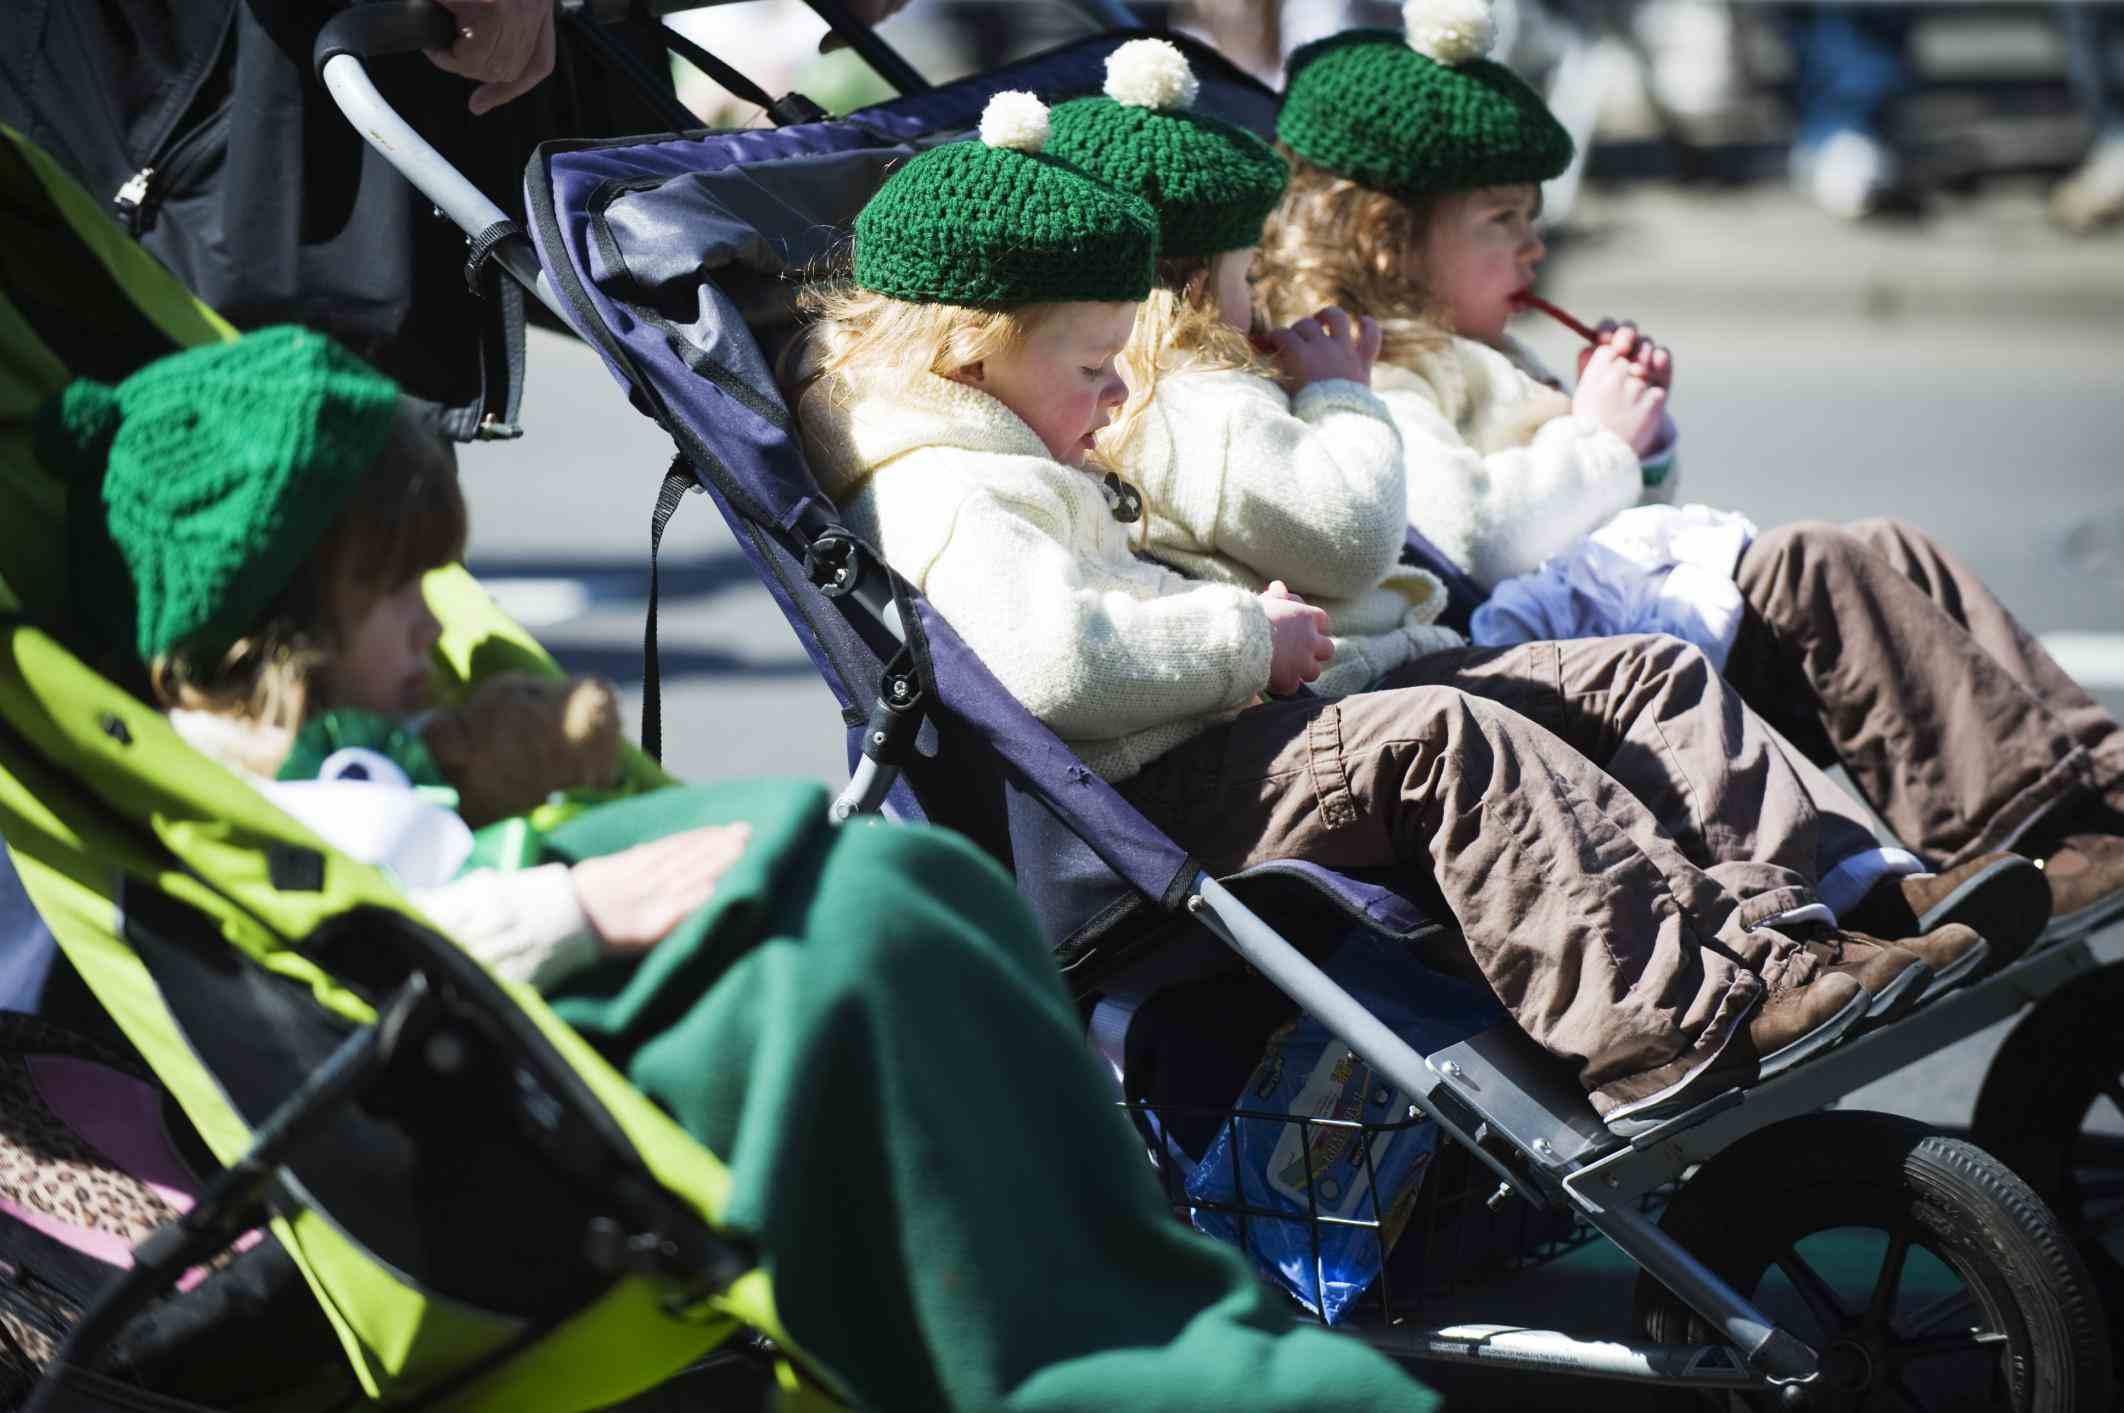 USA, New York State, New York City, Manhattan, girls in green, St Patricks Day celebrations, 5th Avenue